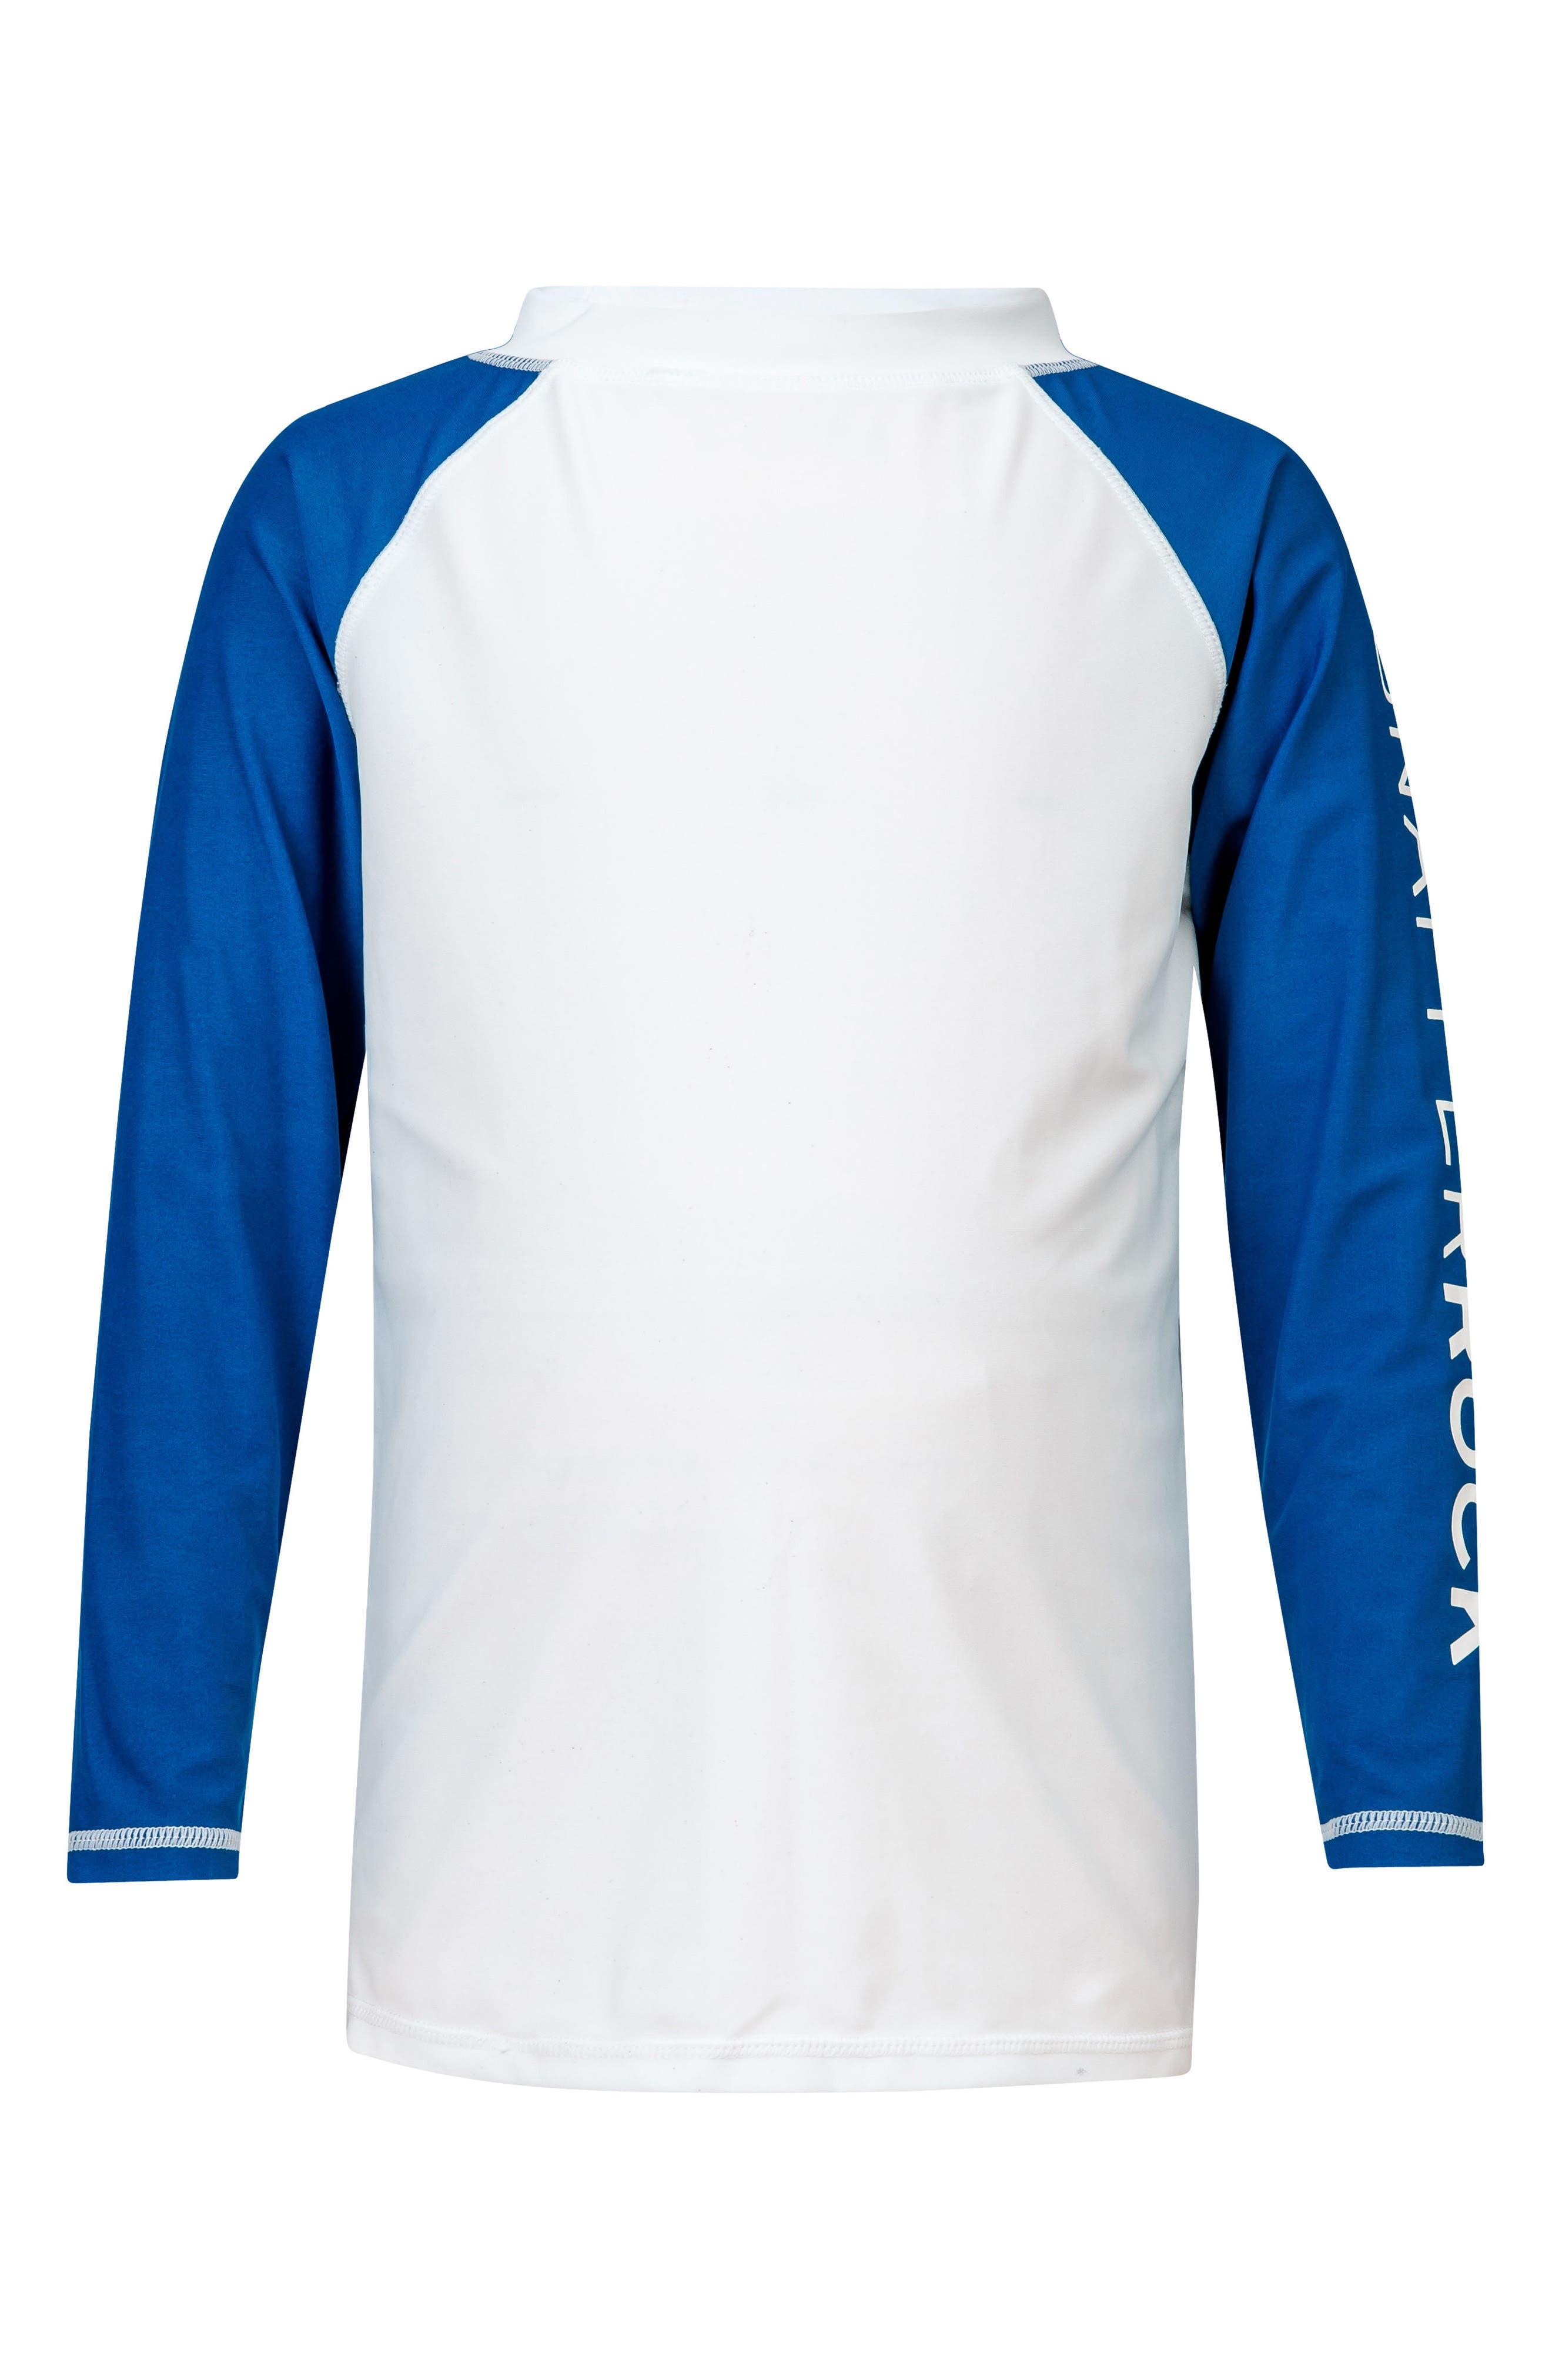 Contrast Long Sleeve Rashguard,                         Main,                         color, White/ Blue